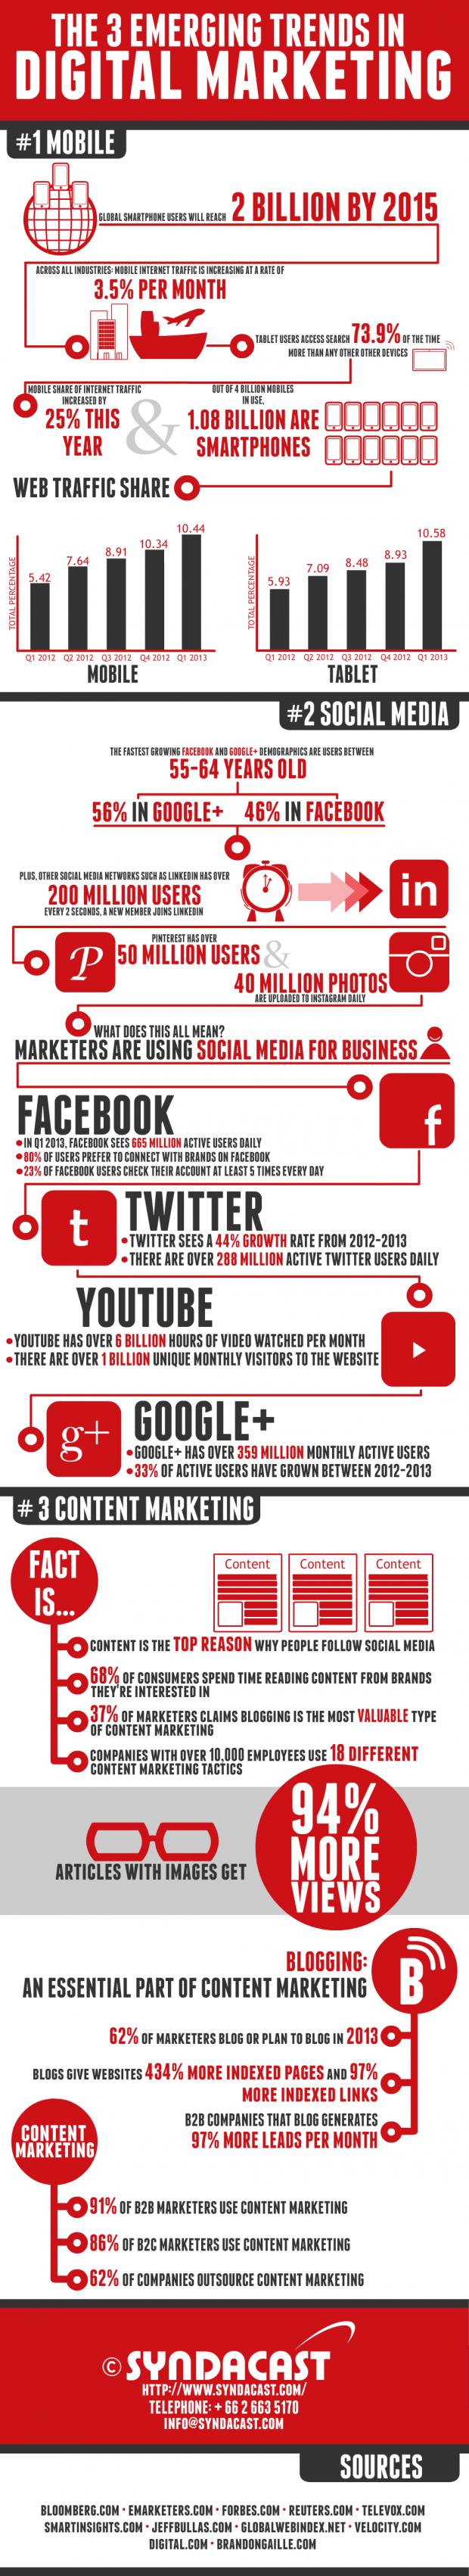 3 tendencias emergentes en marketing digital